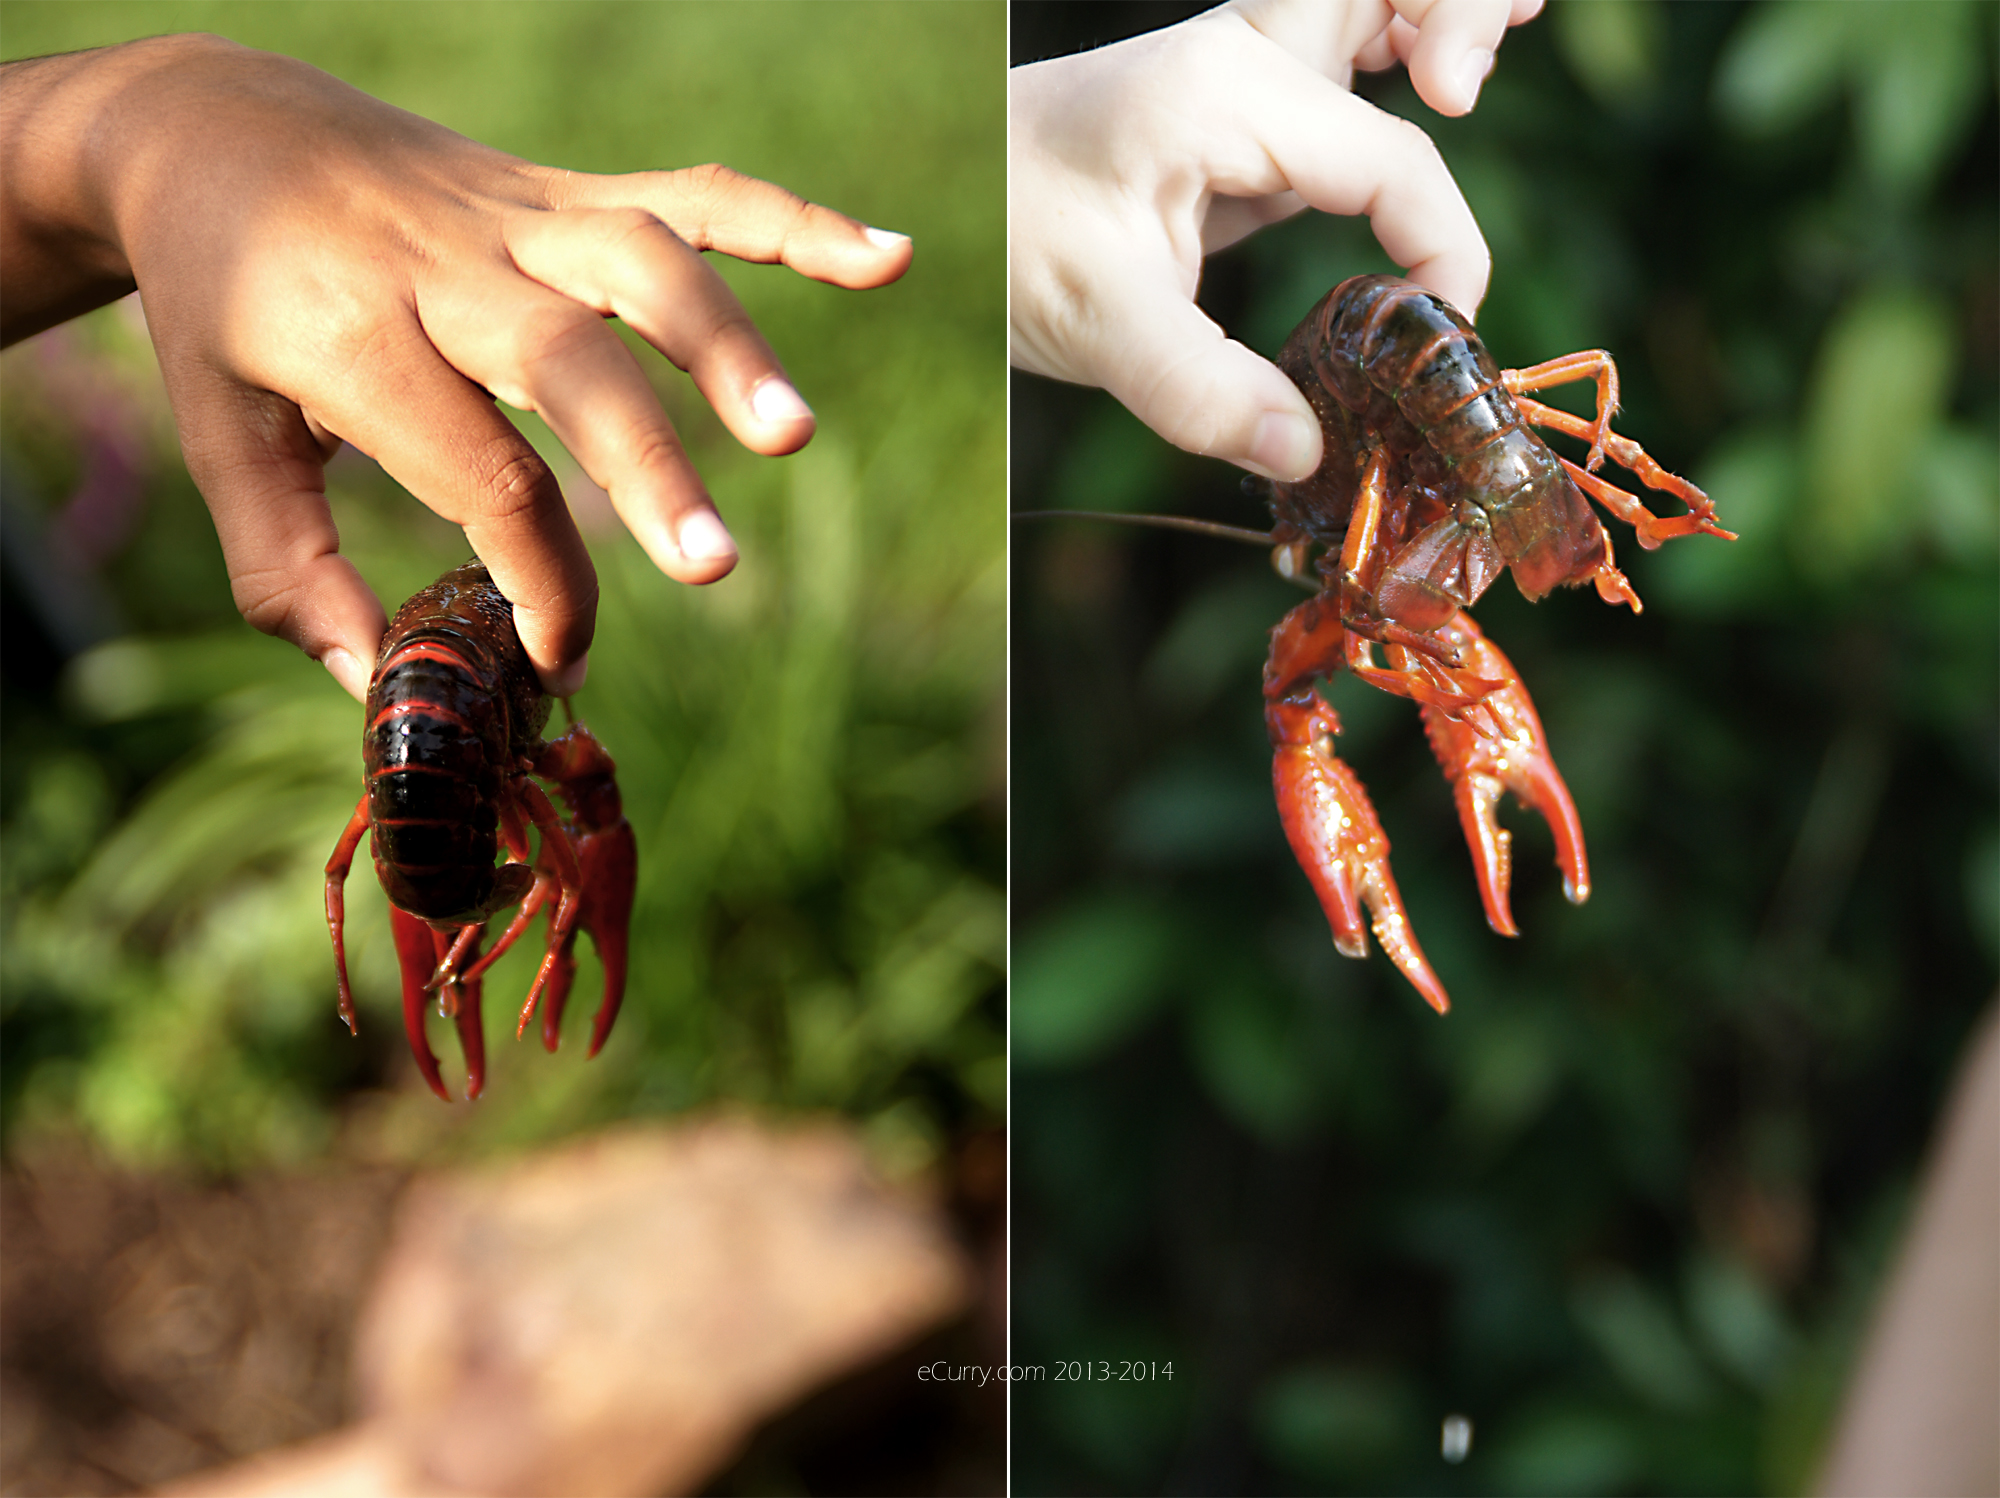 crawfish diptych 1